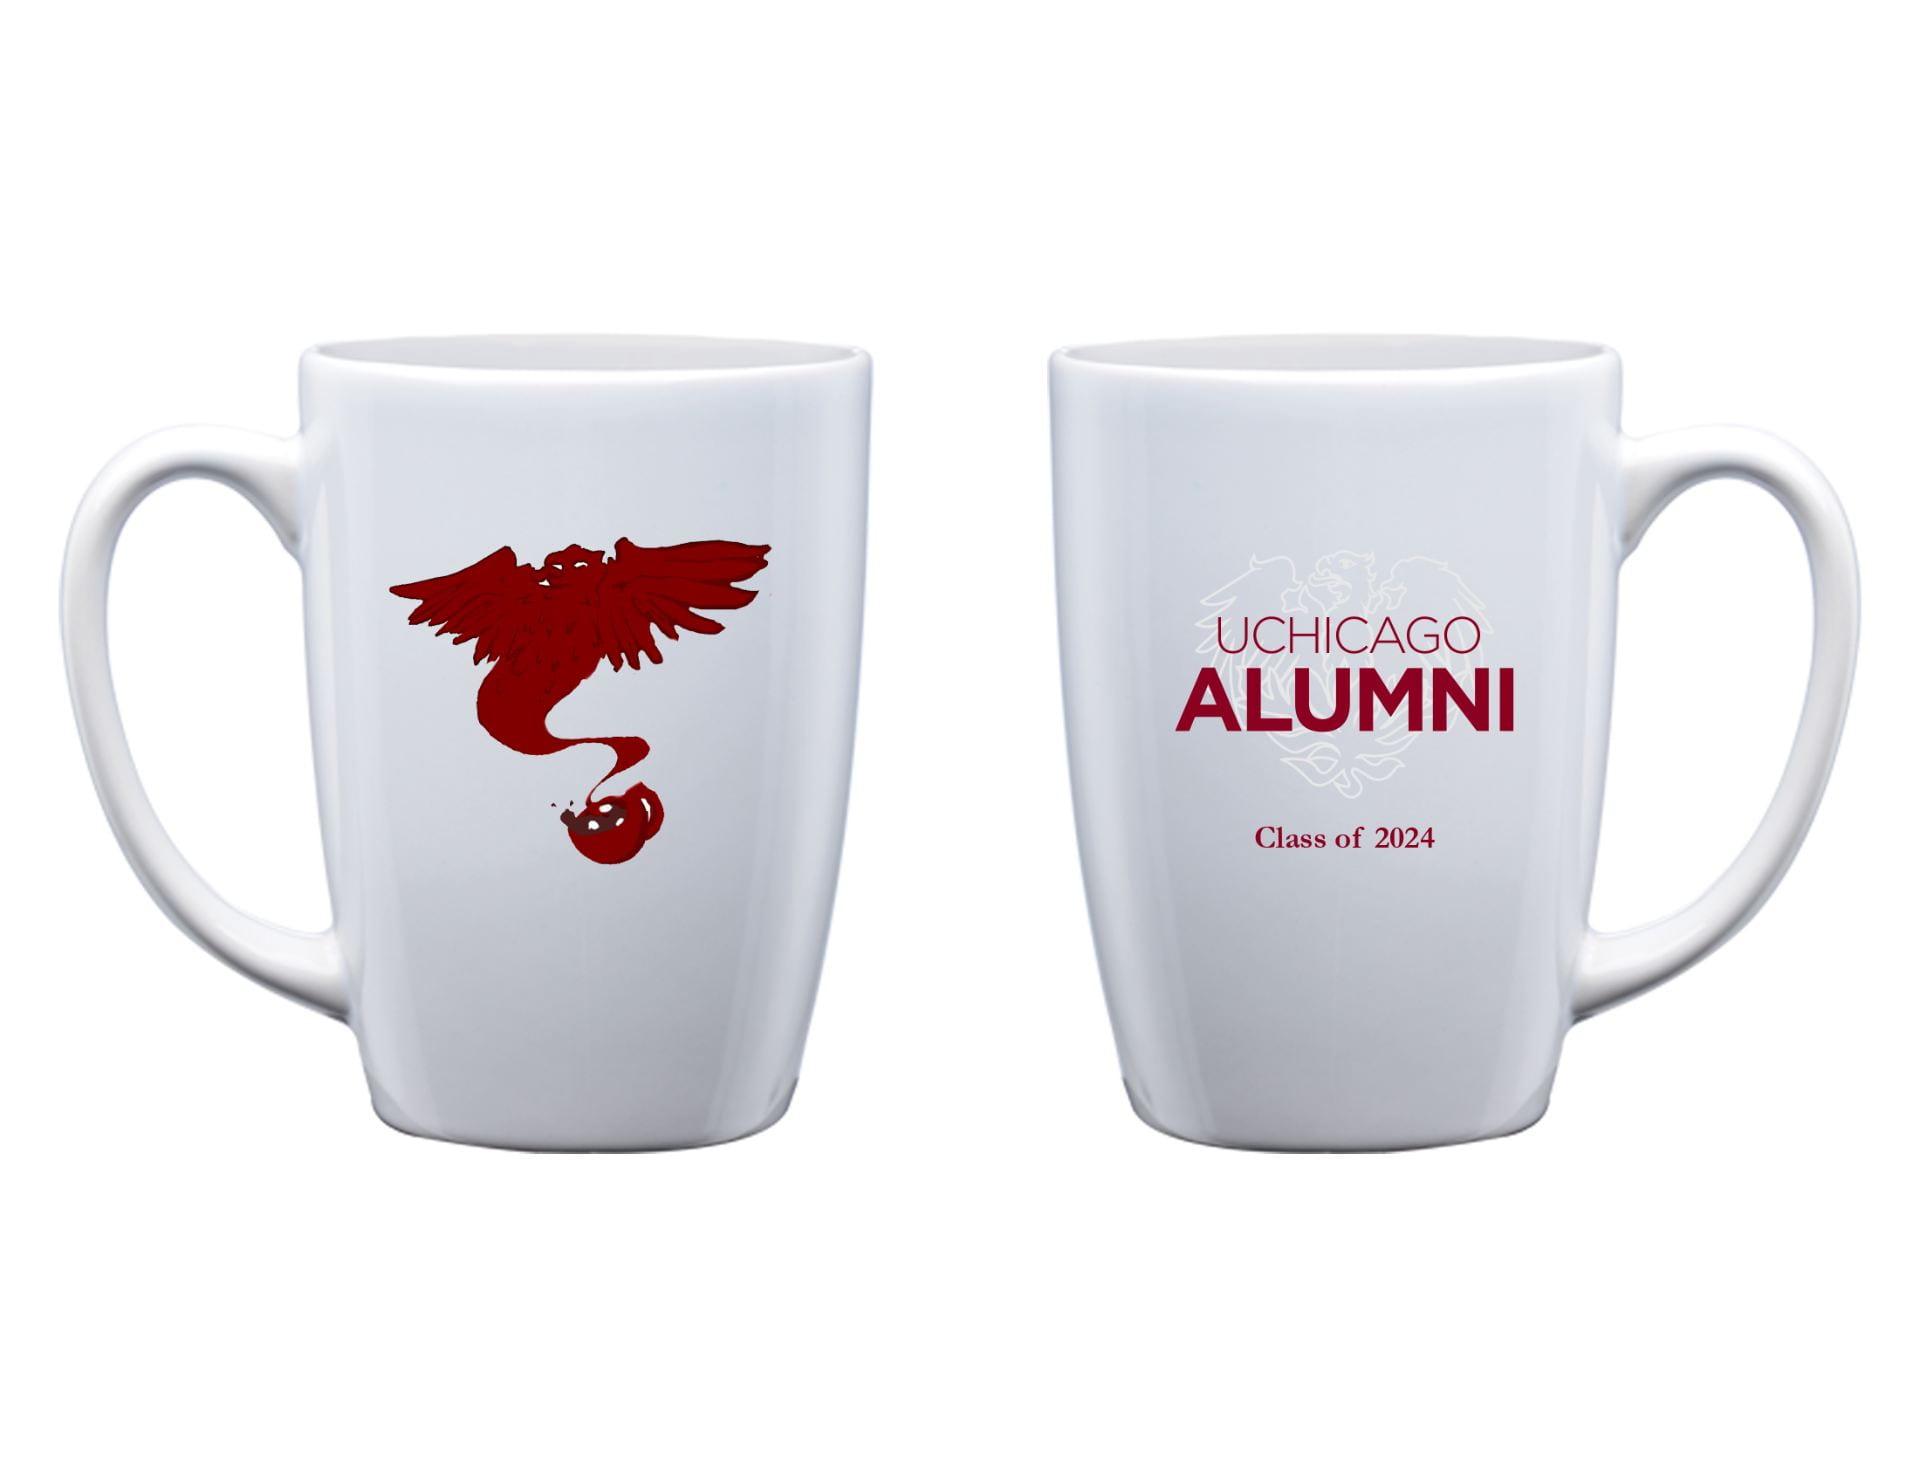 HCN 2021 Mug design by Rena